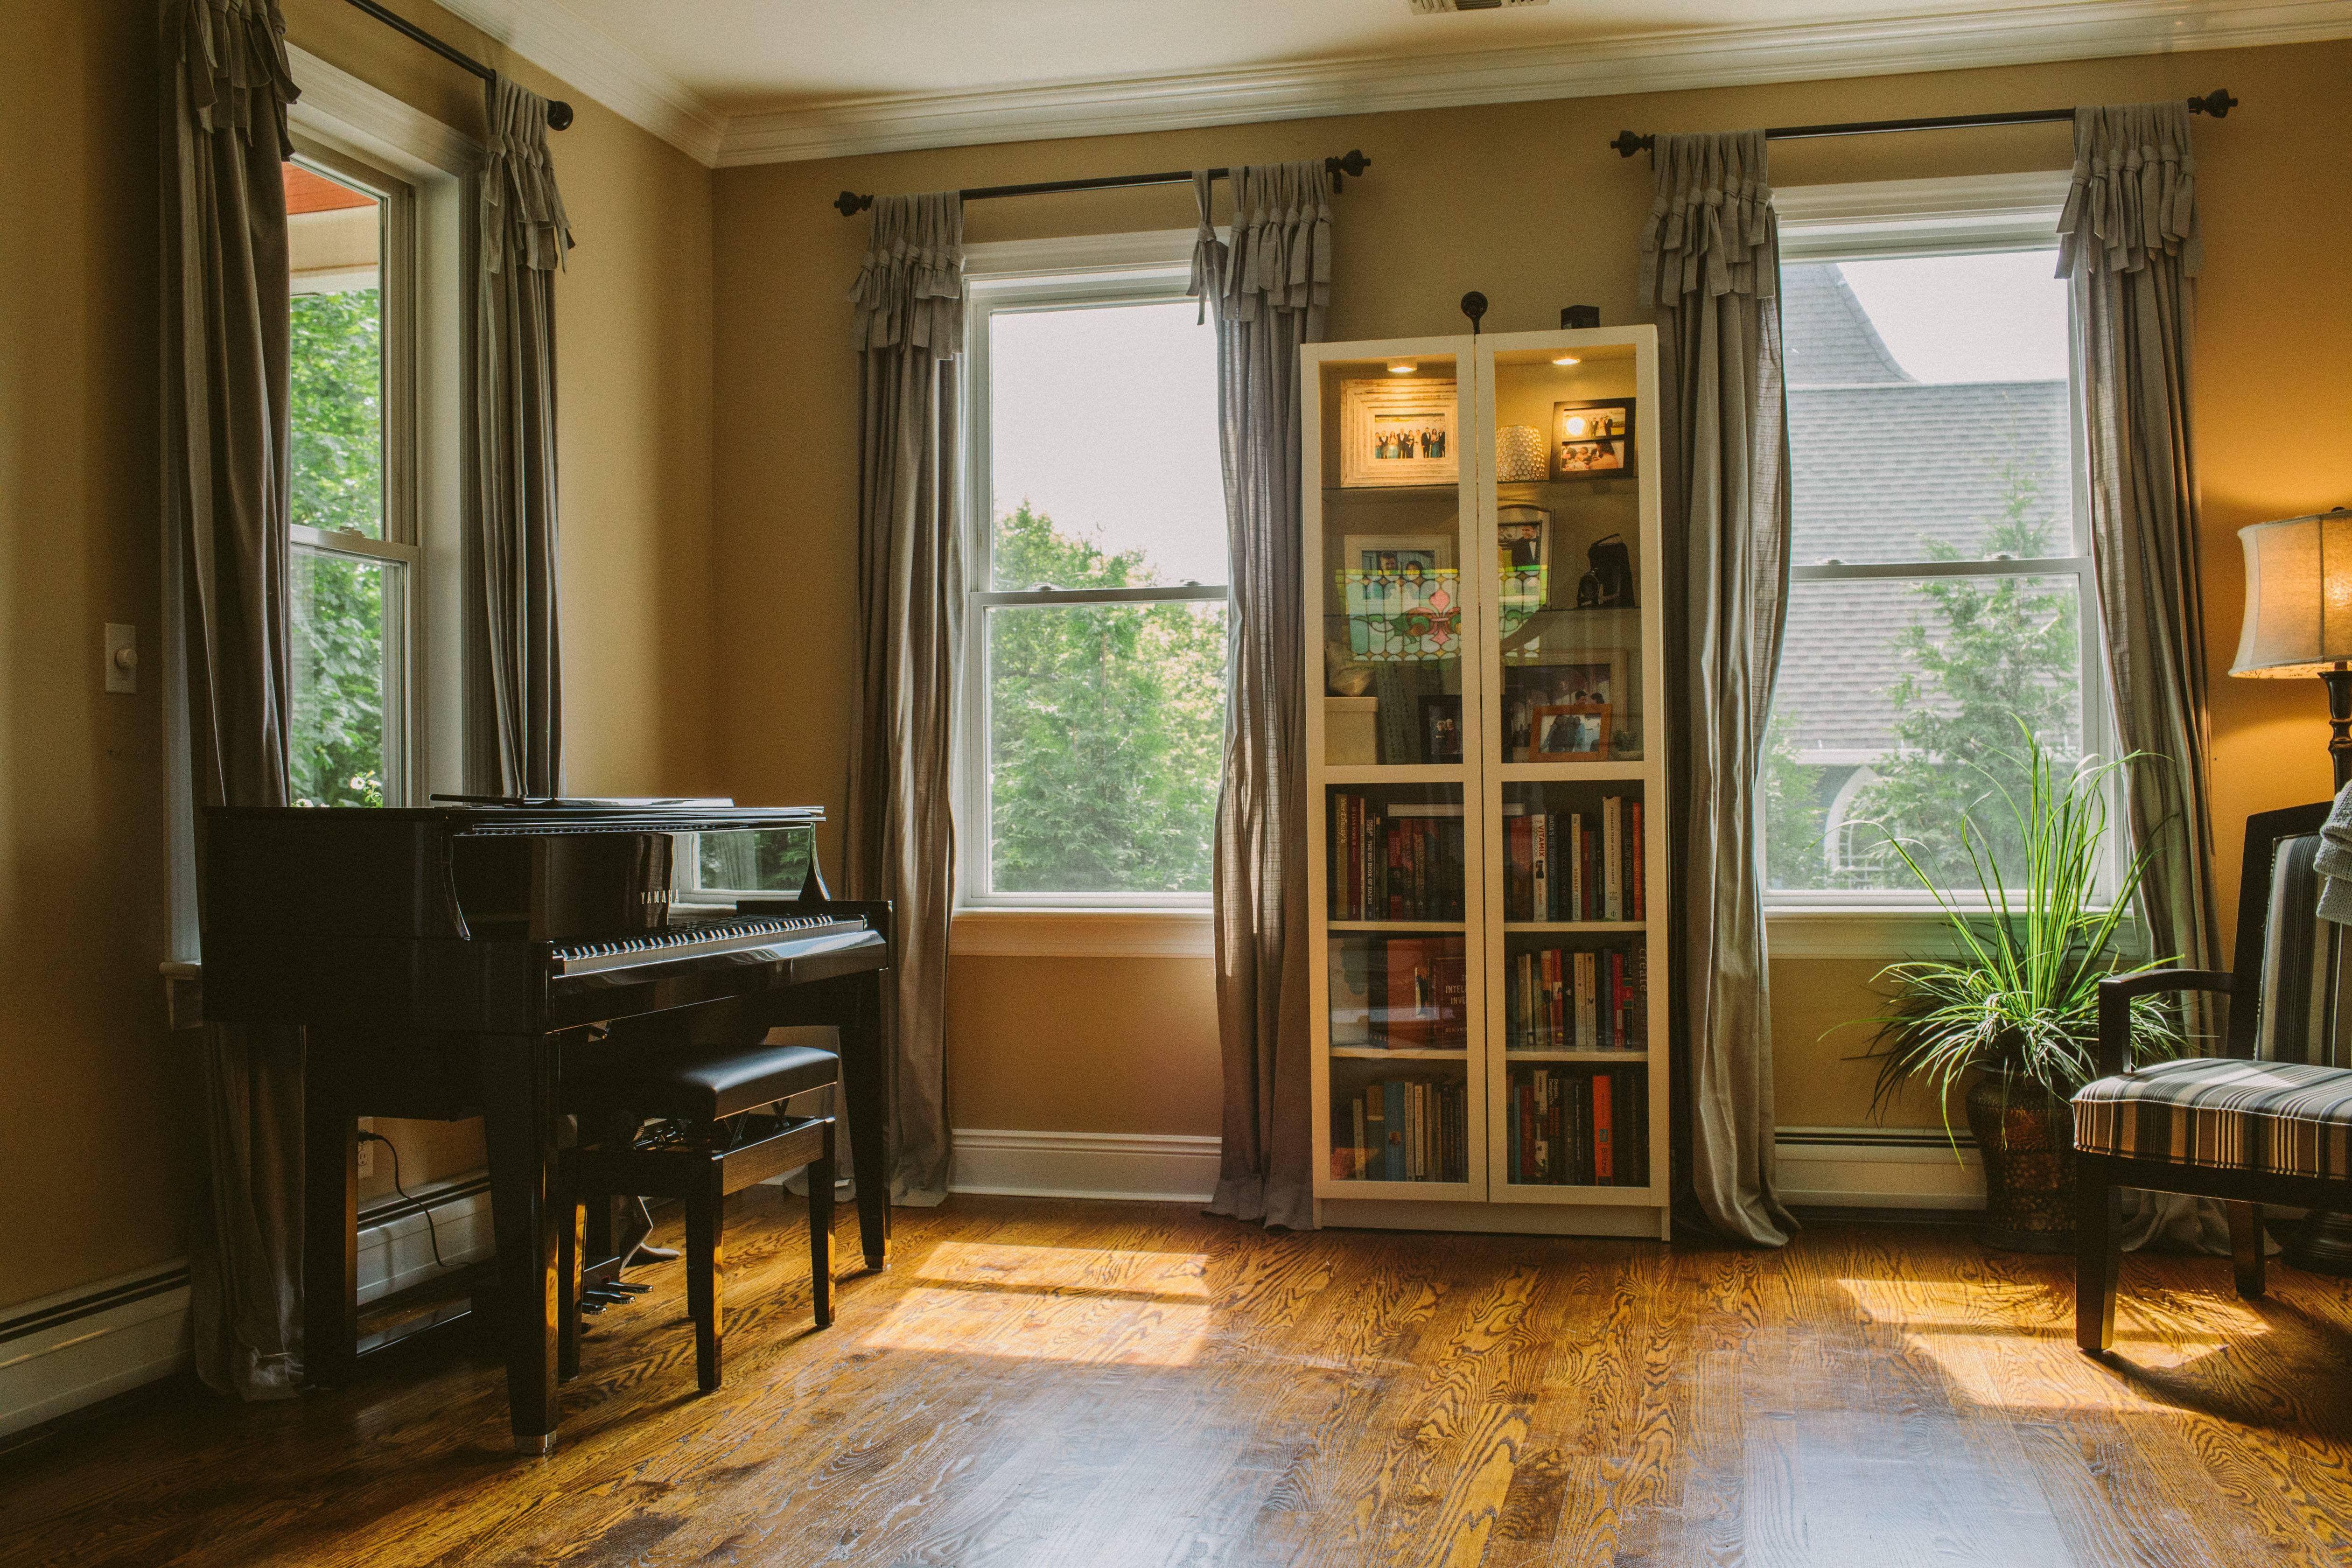 Hausratversicherungkosten Best Ideas Extraordinary Early 1900 Style Living Rooms Collection 5810